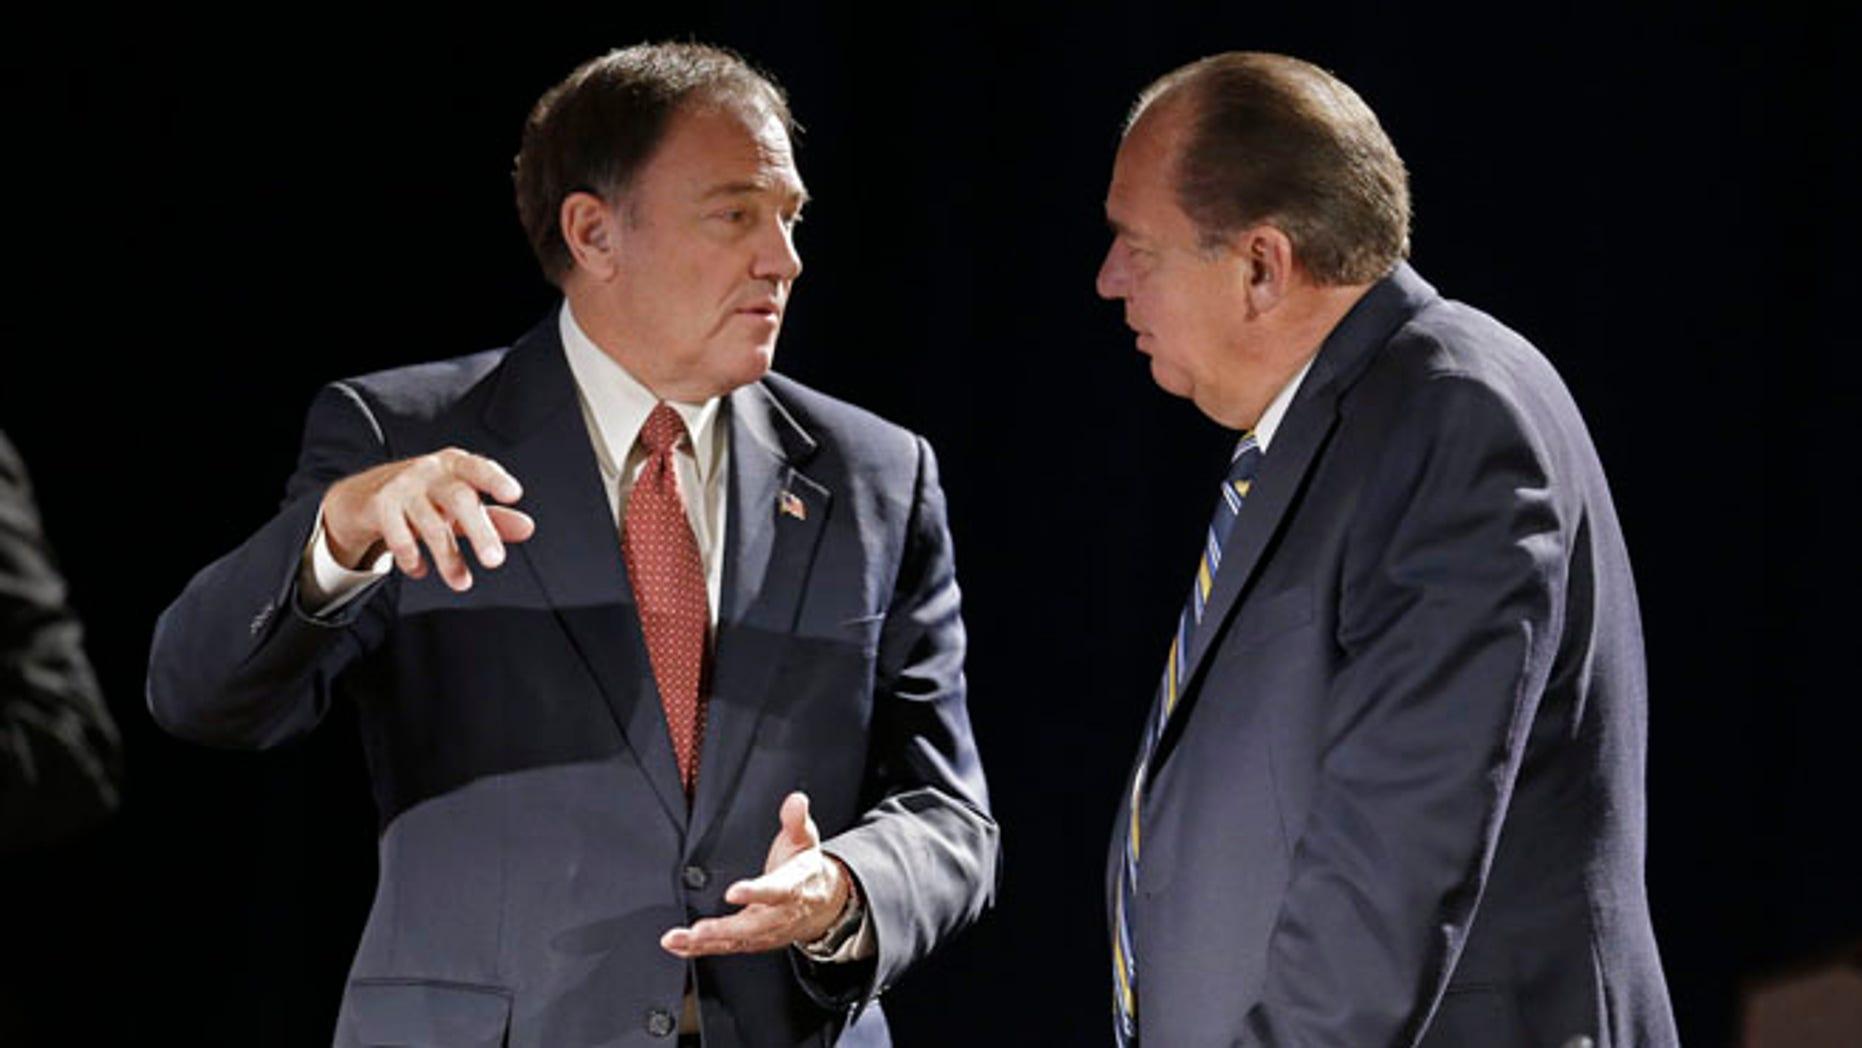 July 13, 2014: Utah Gov. Gary Herbert, left, and West Virginia Gov. Earl Ray Tomblin, at the National Governors Association convention, Nashville, Tenn.